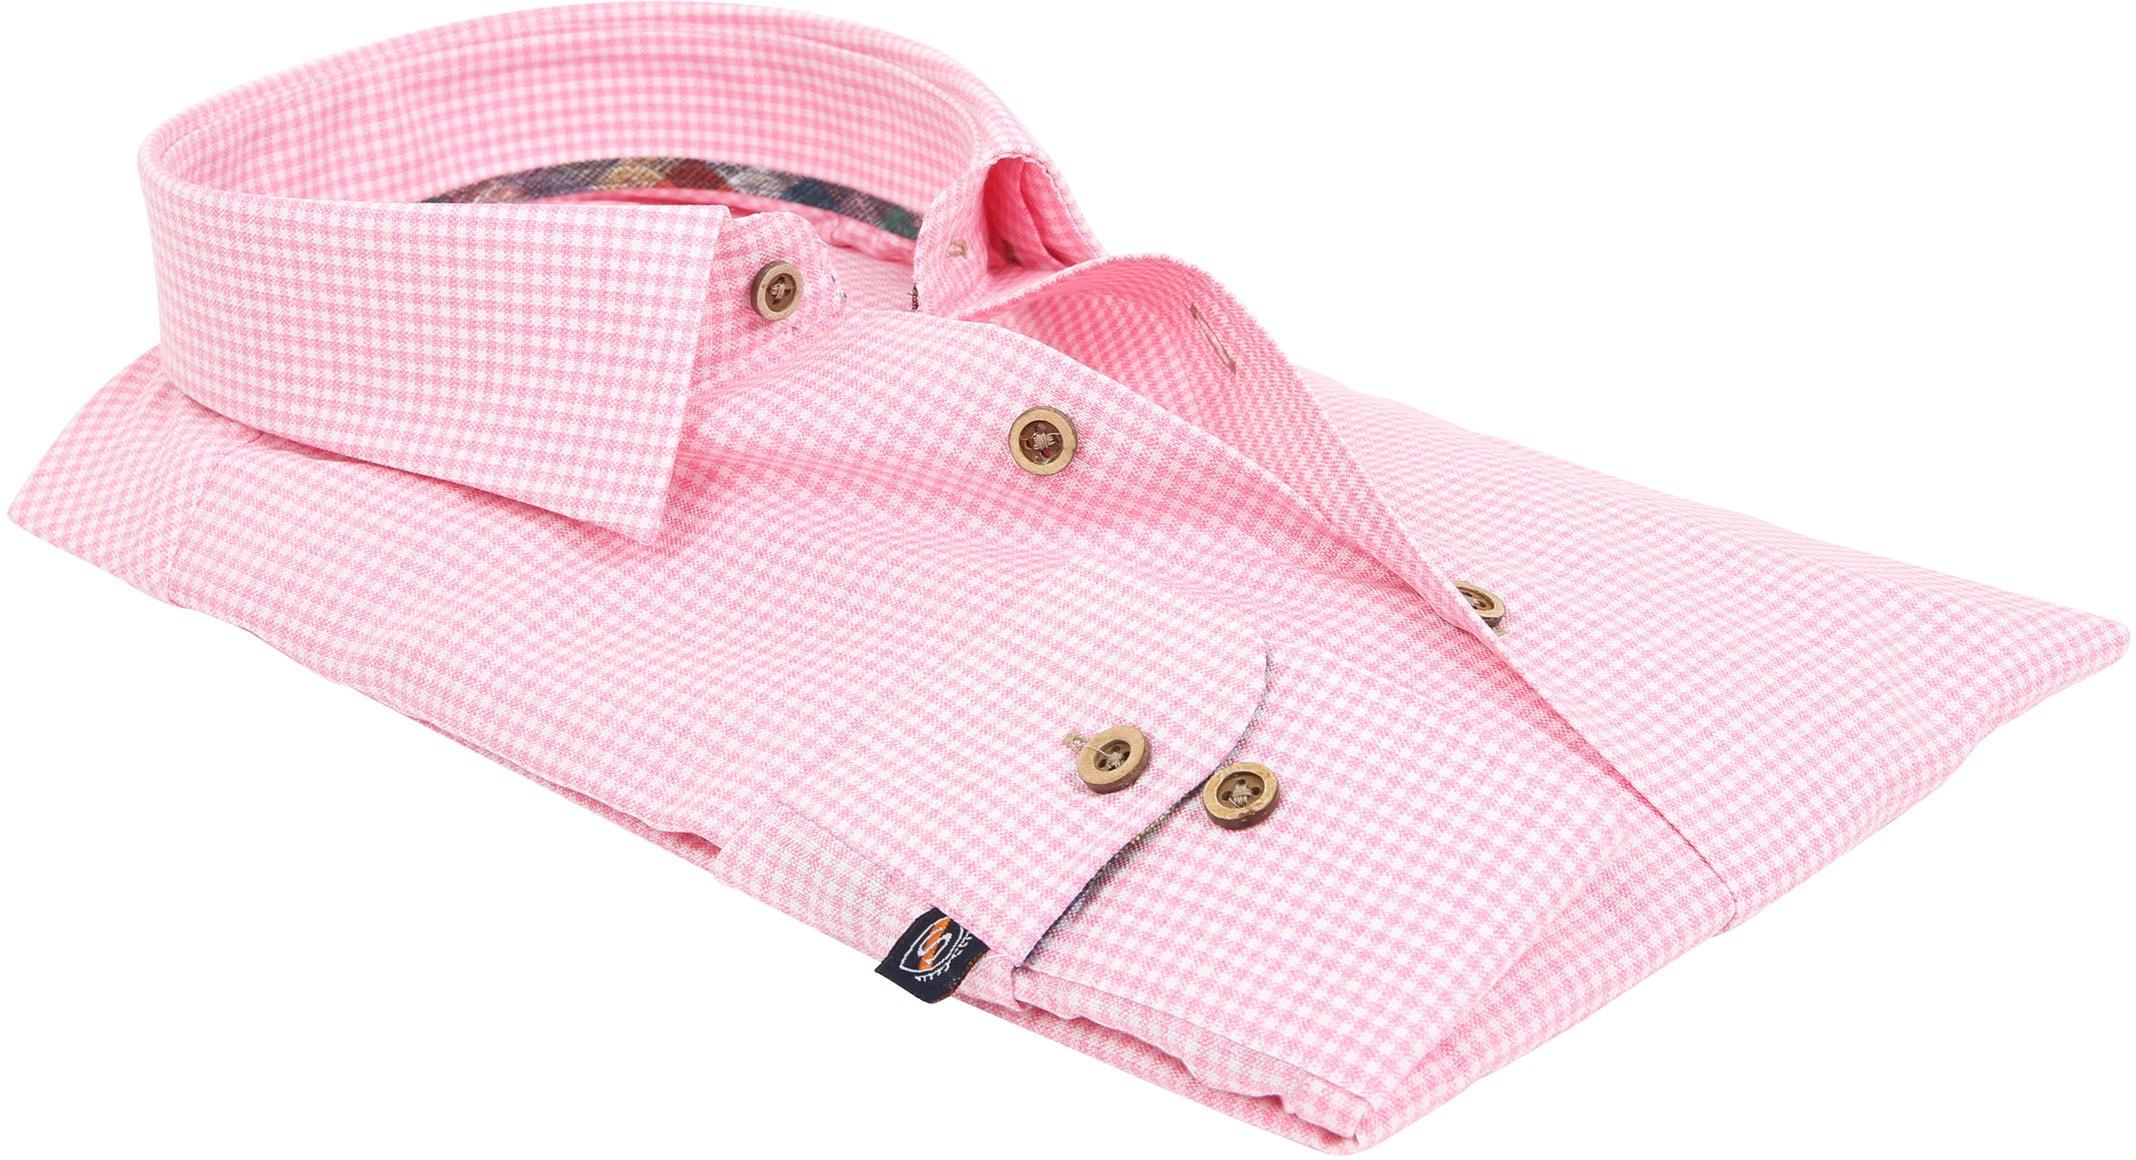 Suitable Overhemd Roze Ruit 181-6 foto 3